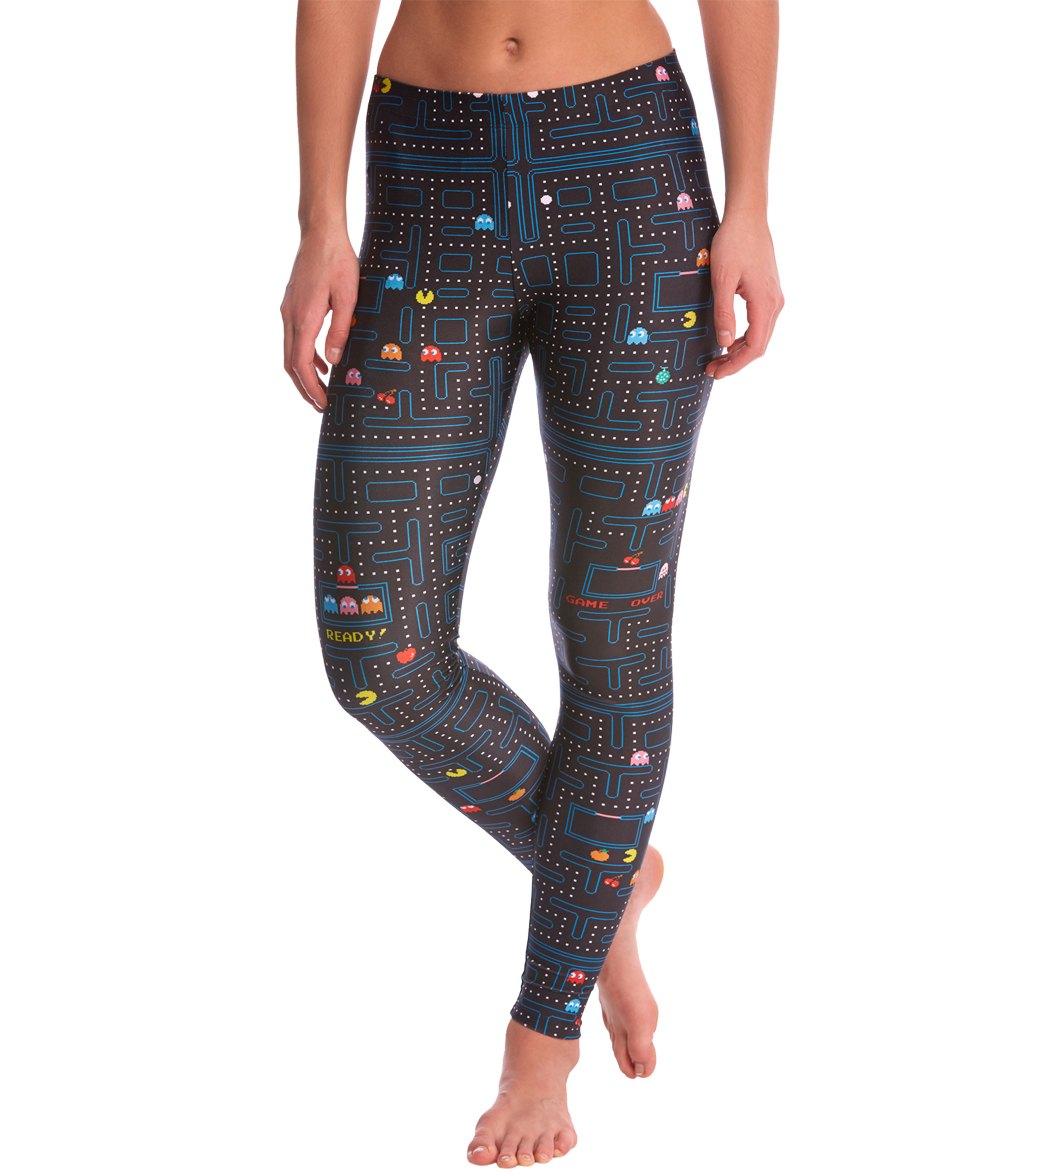 2e8b22666efb4 Poprageous Pacman Yoga Leggings at YogaOutlet.com - Free Shipping